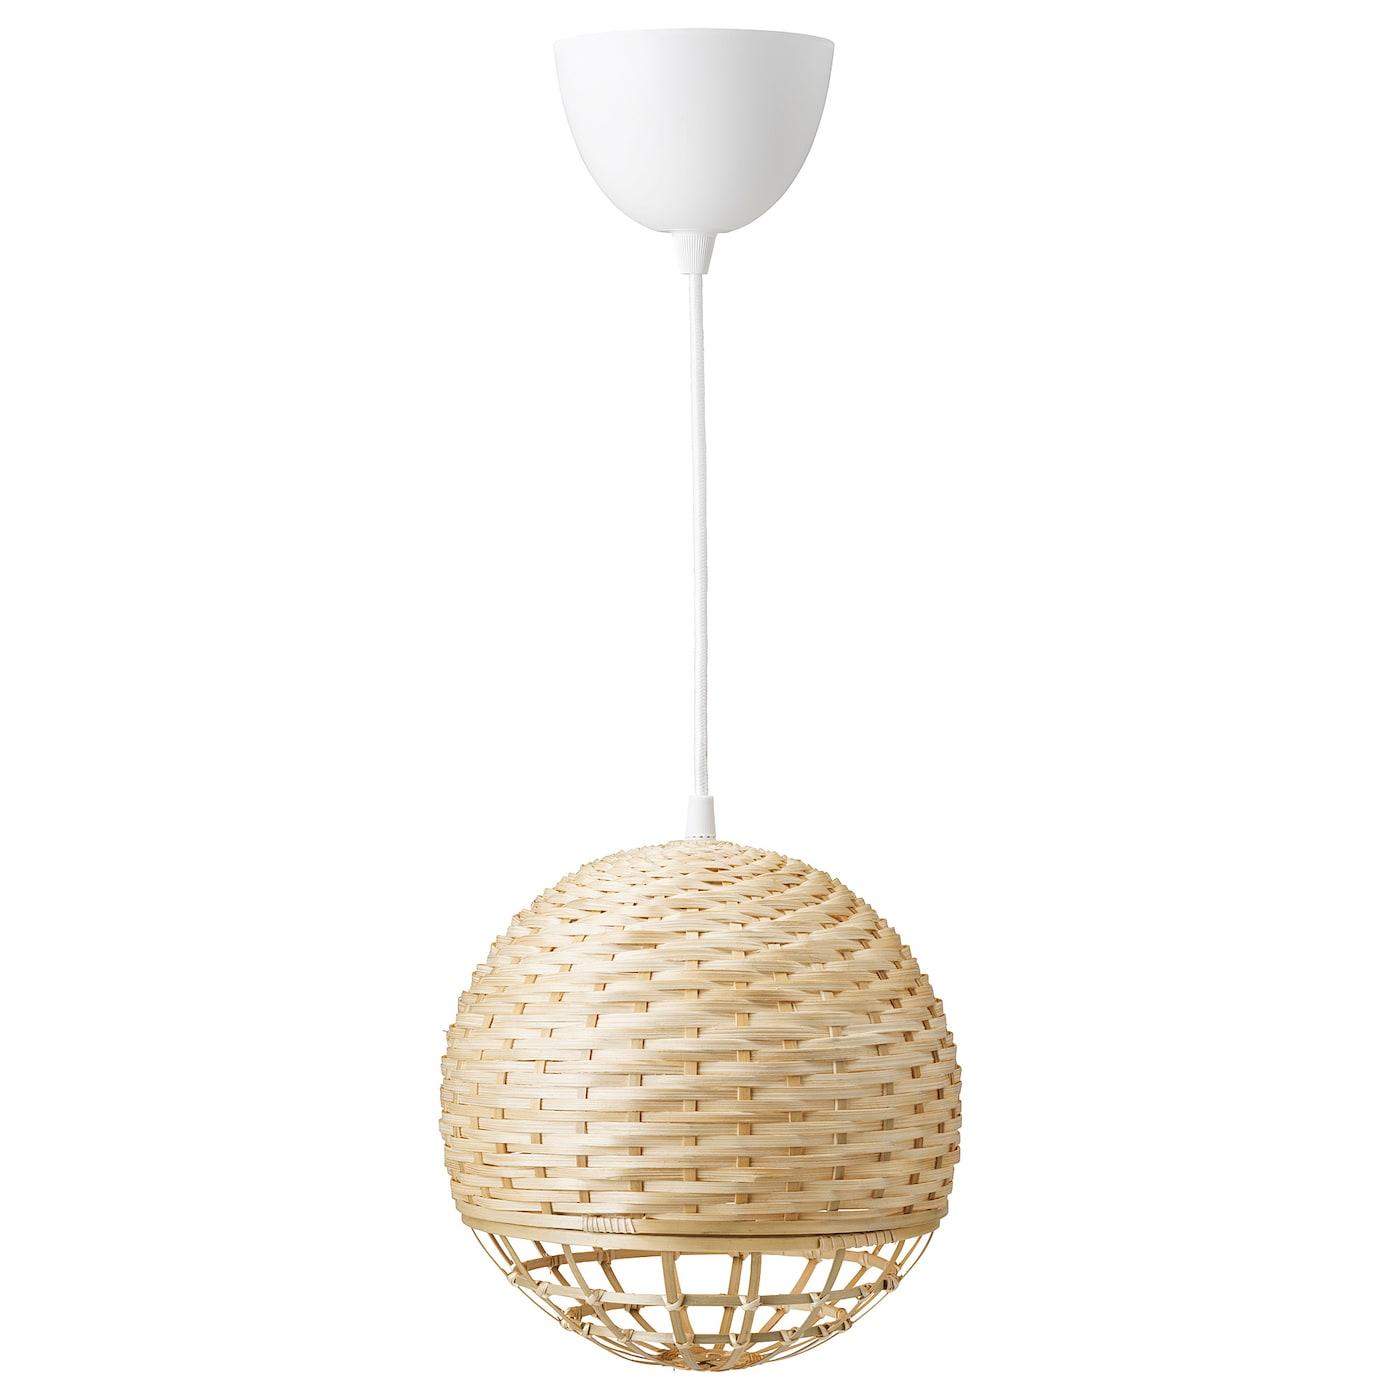 suspensions design suspensions led ikea. Black Bedroom Furniture Sets. Home Design Ideas